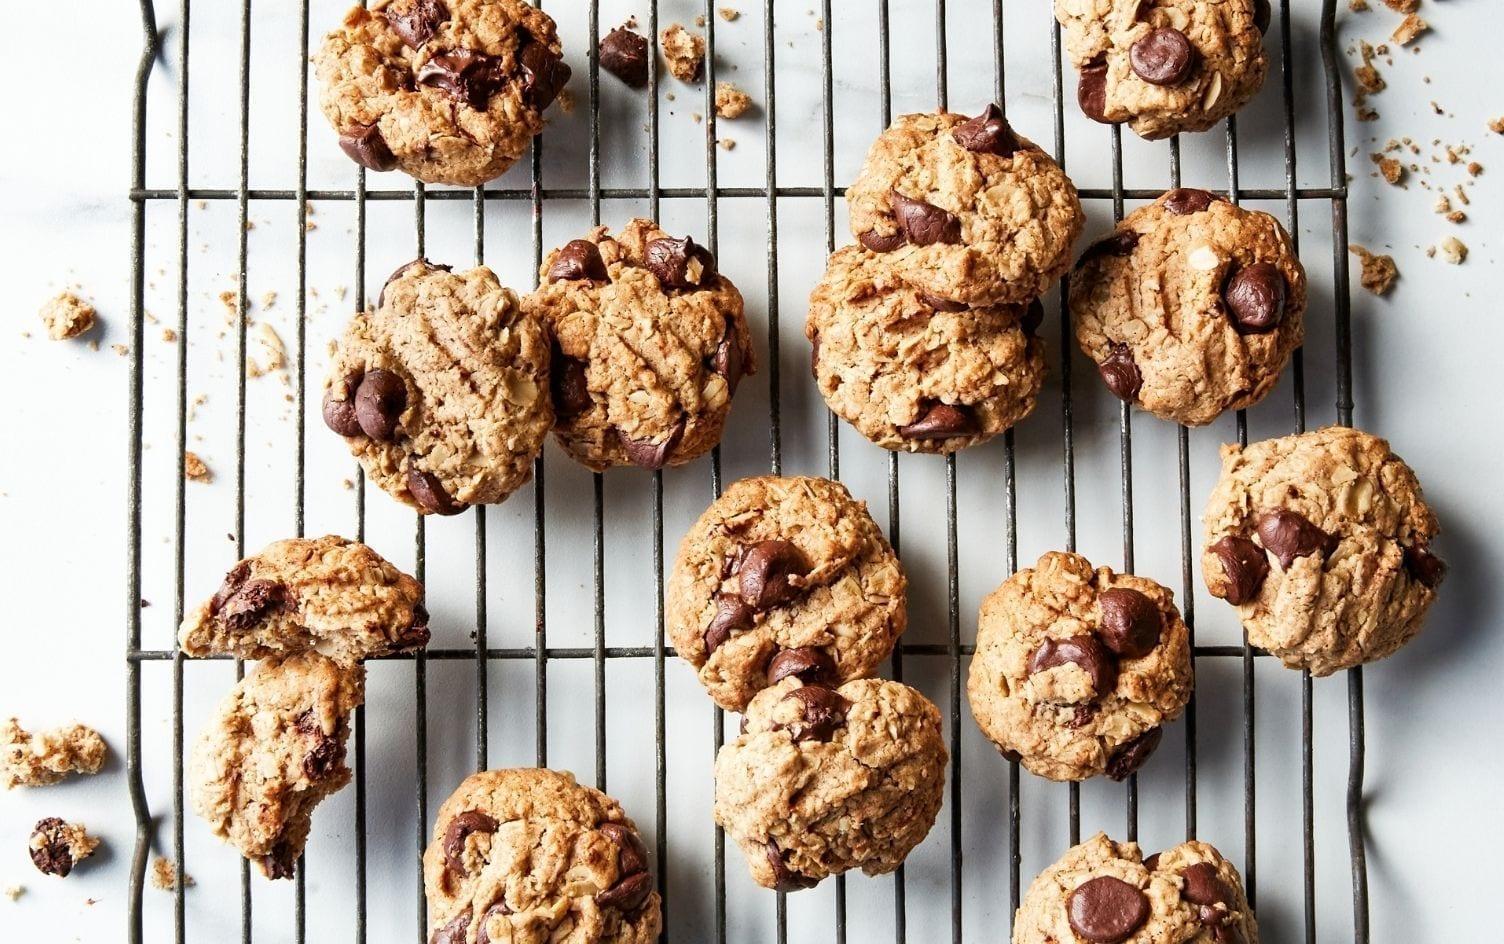 Crunchy Vegan Oat Chocolate Chip Cookies